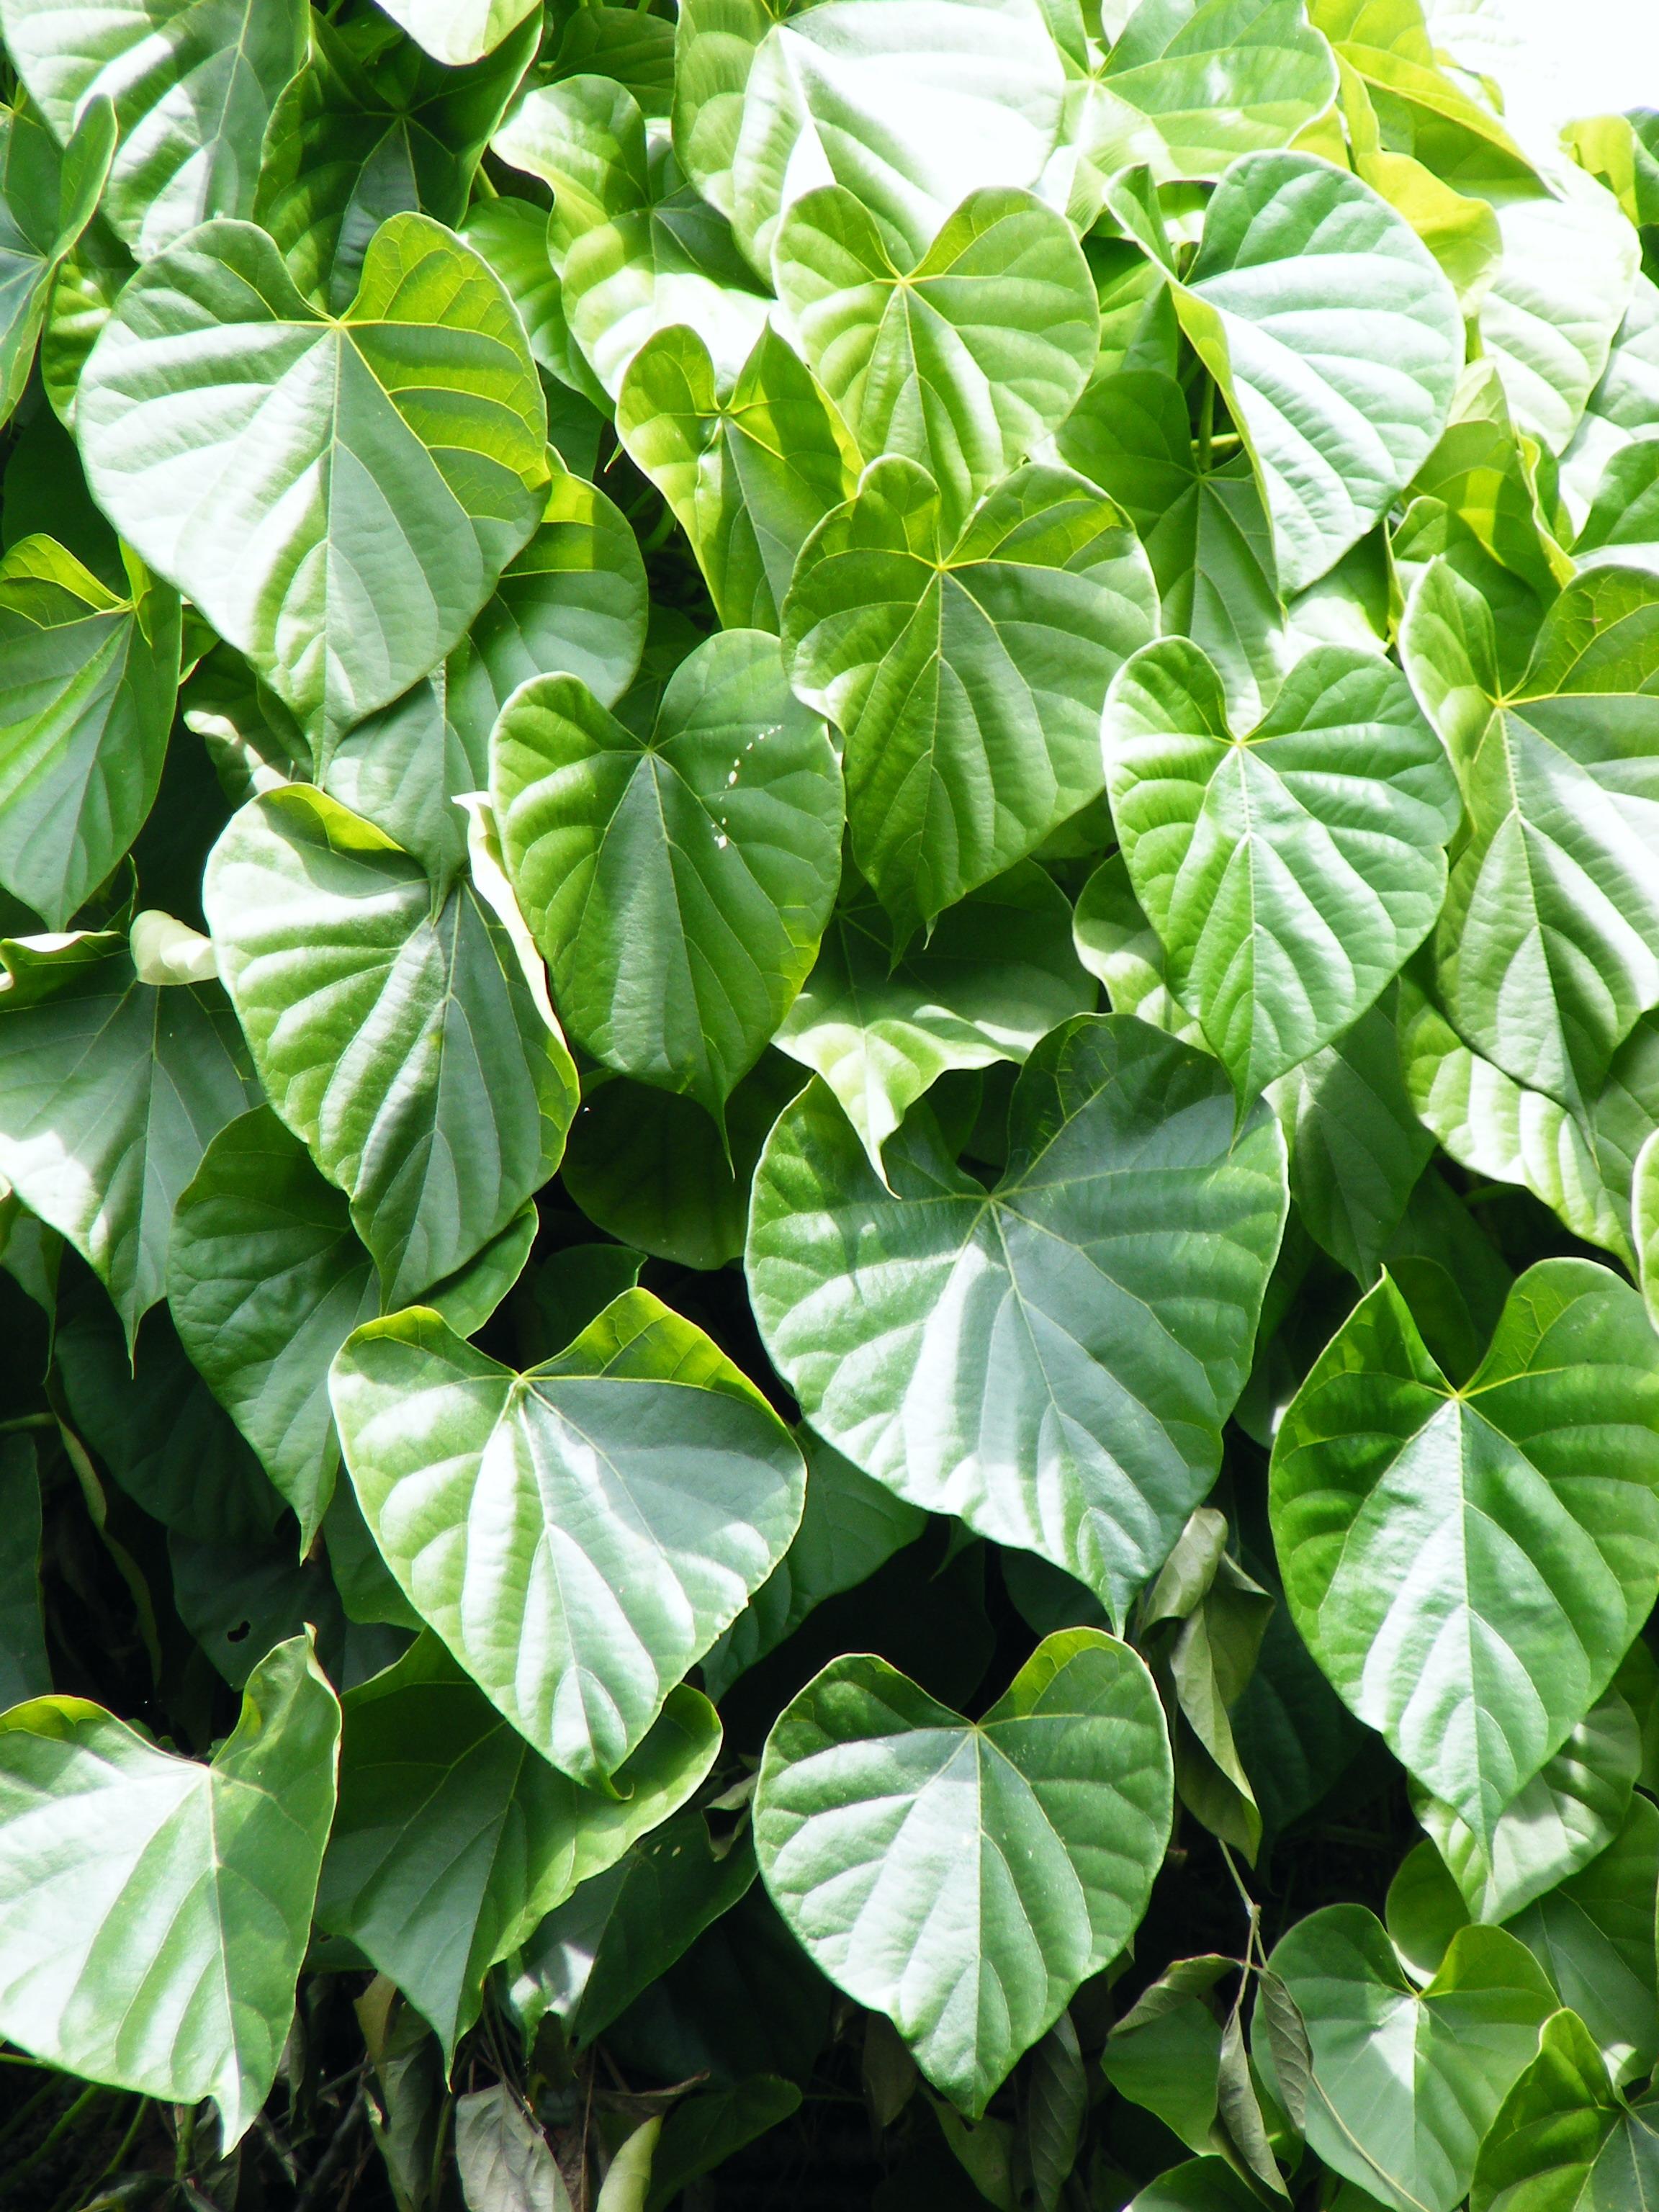 File:Tinospora cordifolia.jpg - Wikipedia